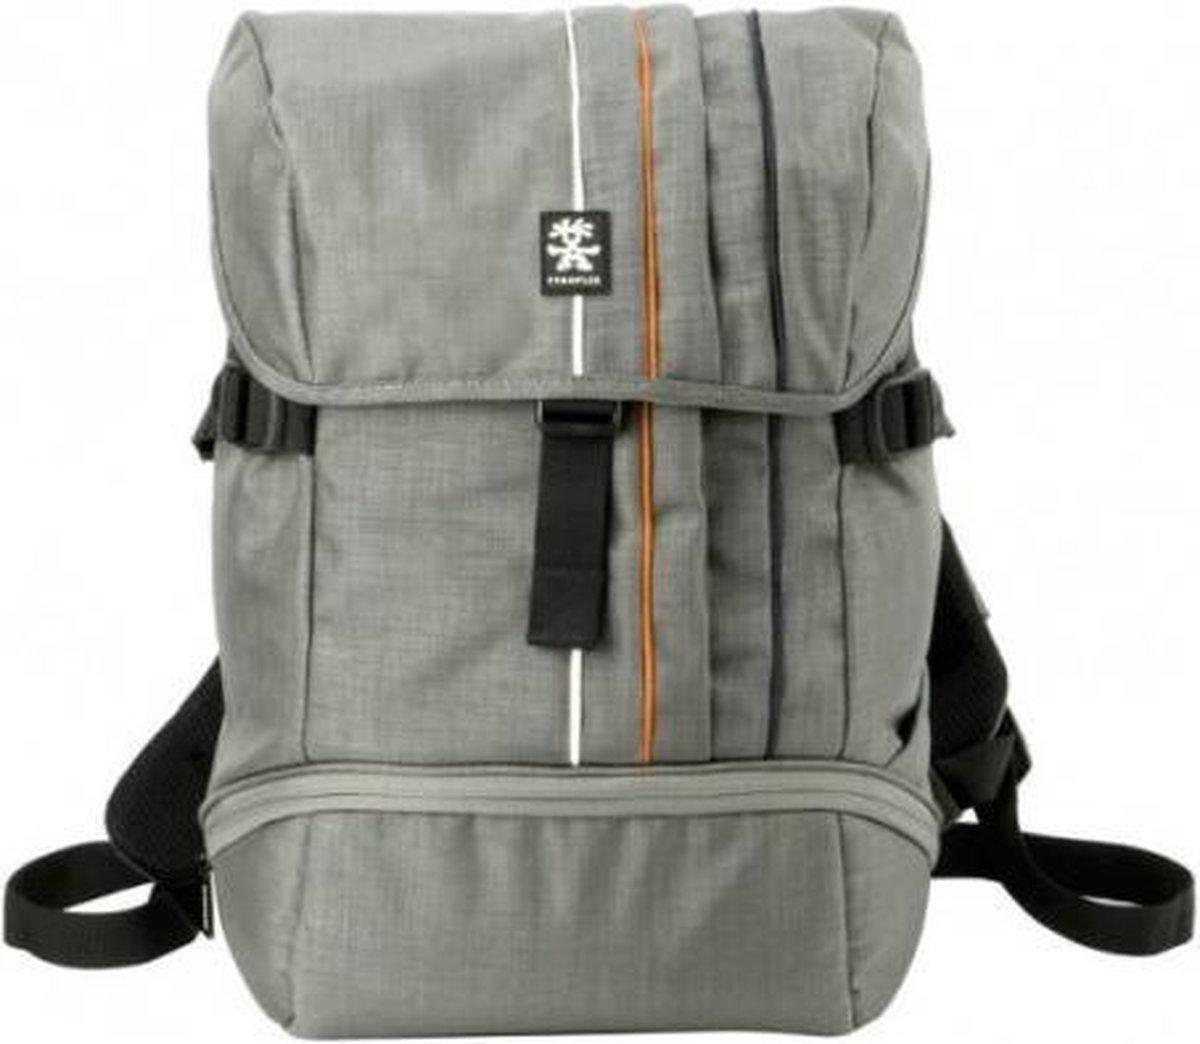 patio de recreo Hacer pedir disculpas  bol.com   Crumpler Jackpack Half Photo System Backpack